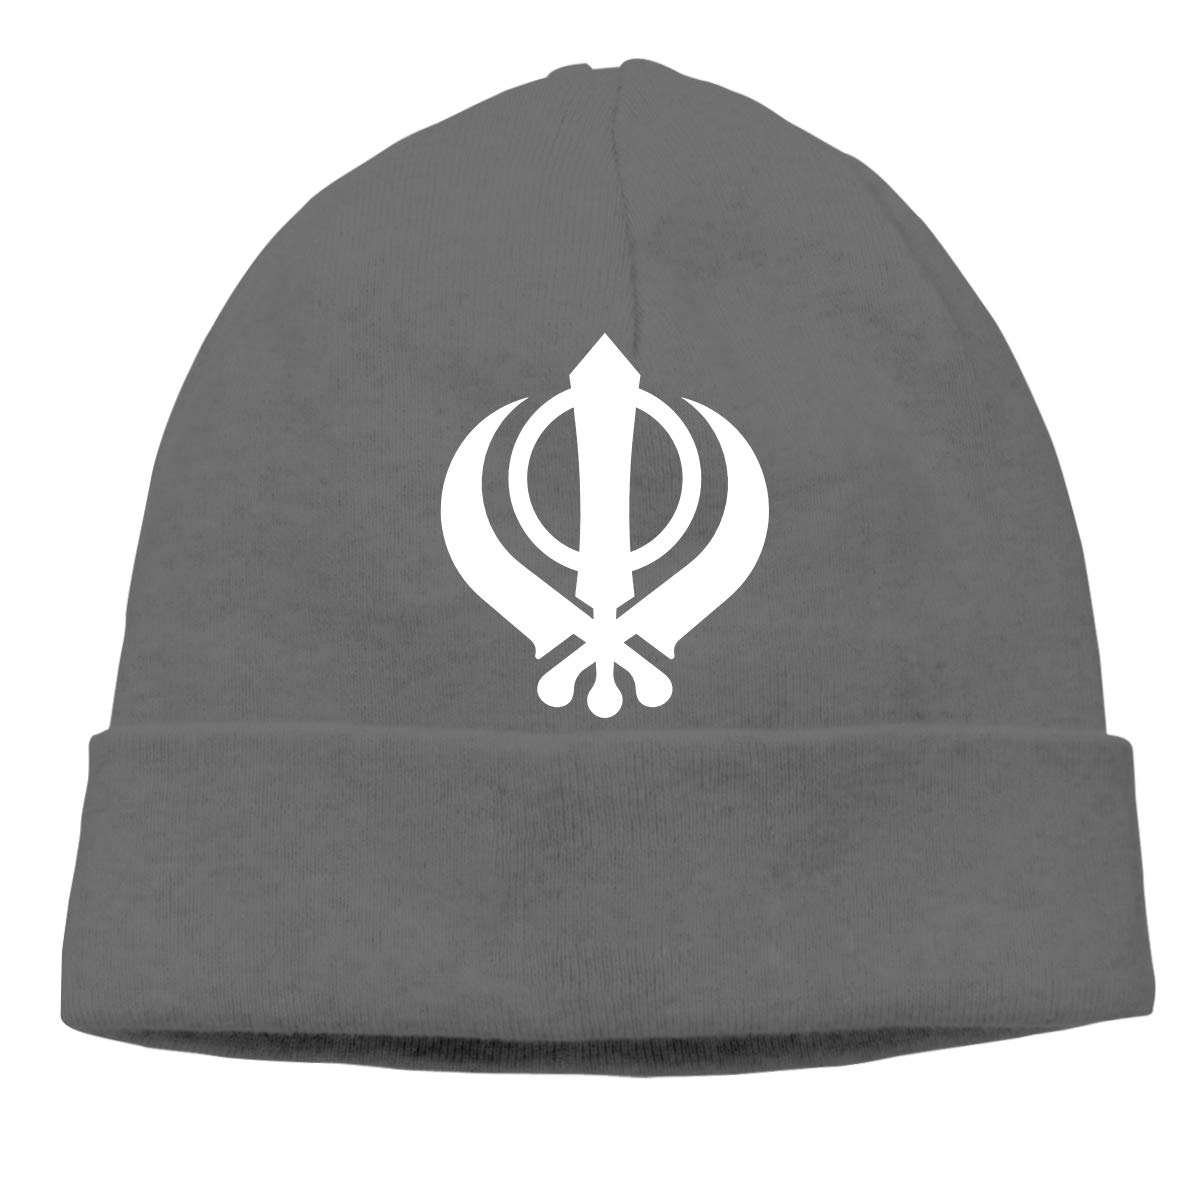 FORDSAN CP Sikh Mens Beanie Cap Skull Cap Winter Warm Knitting Hats.